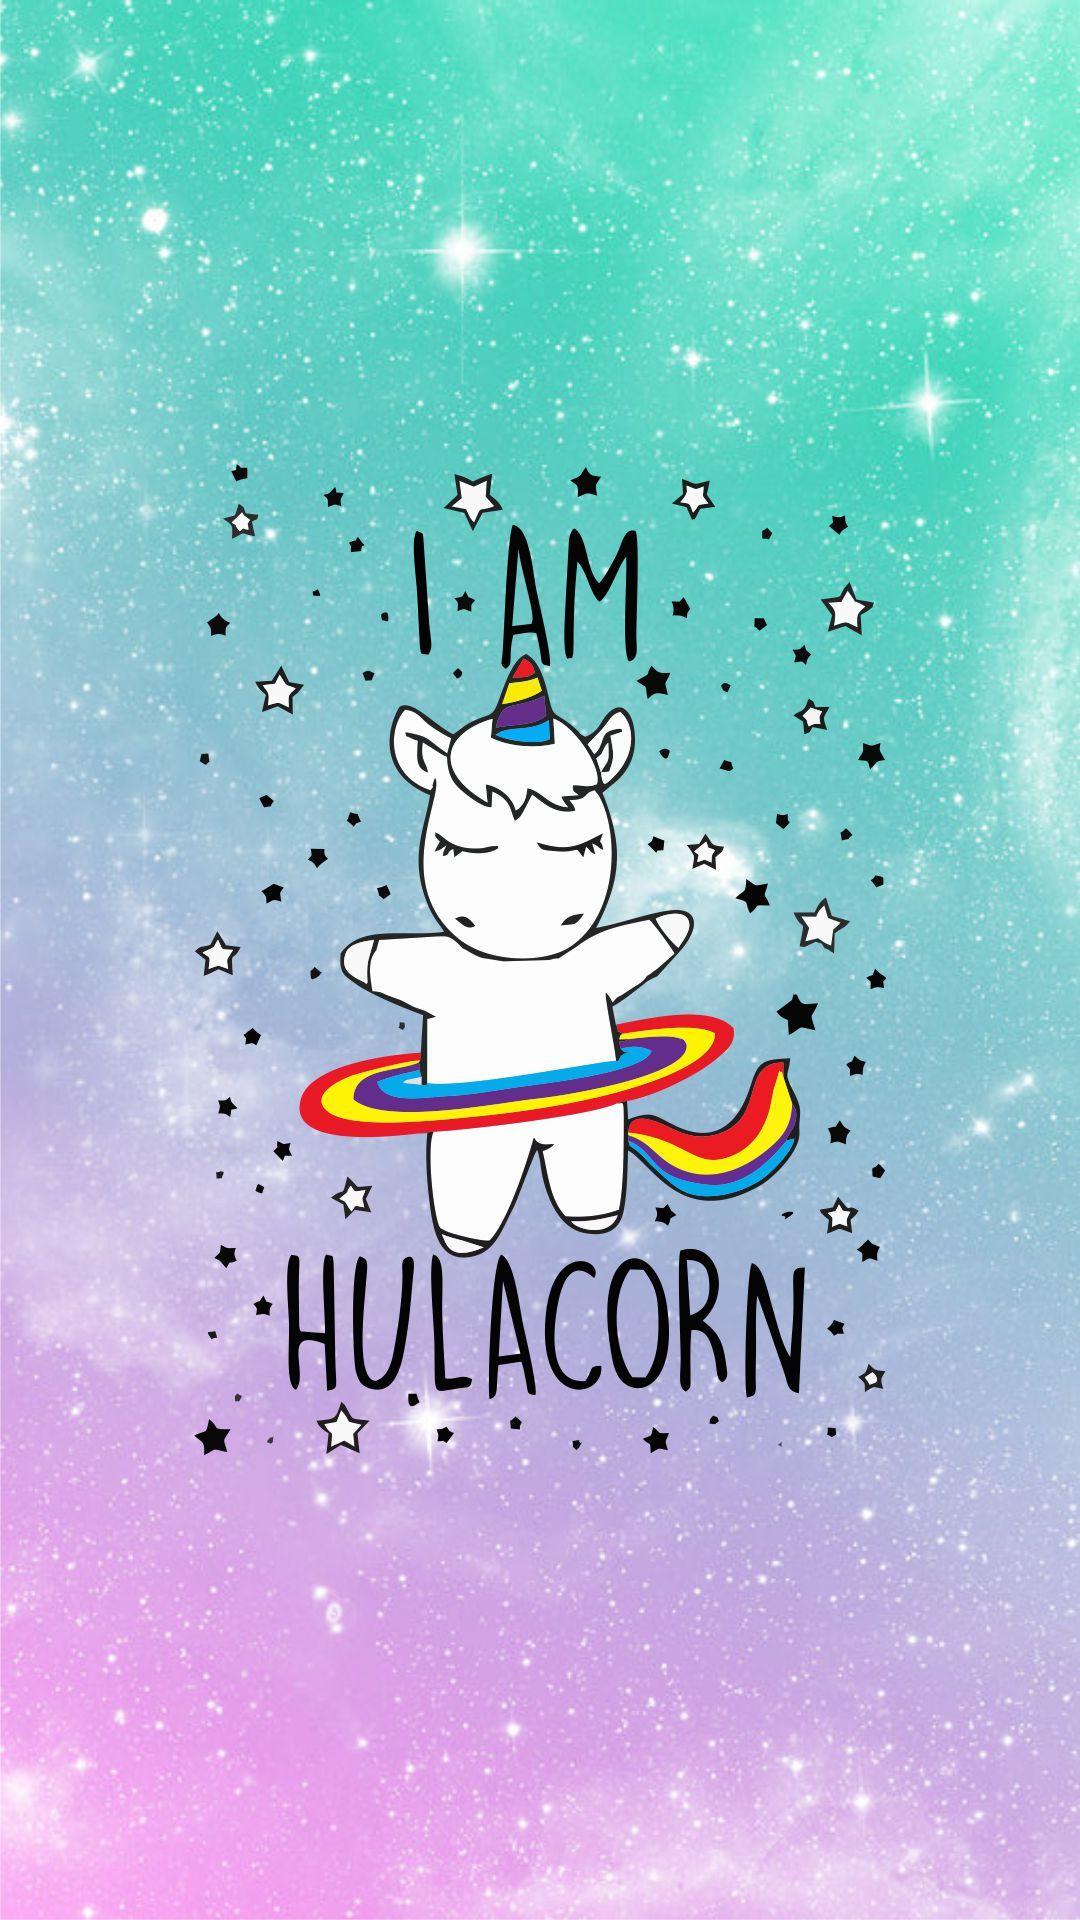 Hulacorn Wallpaper Iphone Wallpaper Pinterest Unicorn